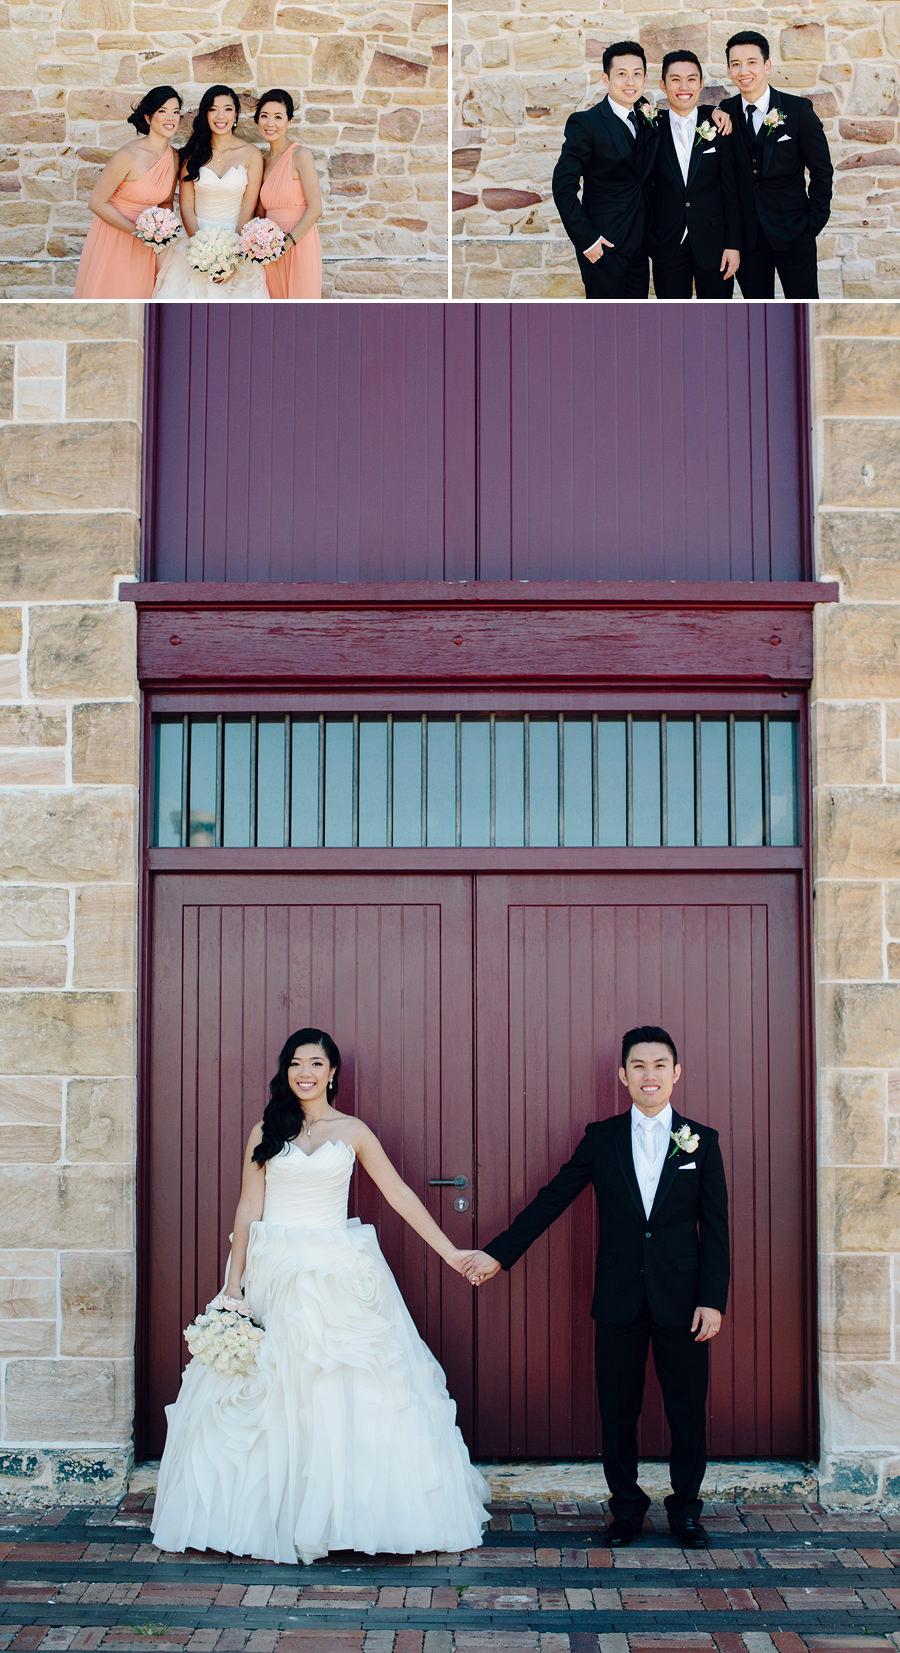 Illoura Reserve Wedding Photographer: Bridal party portraits